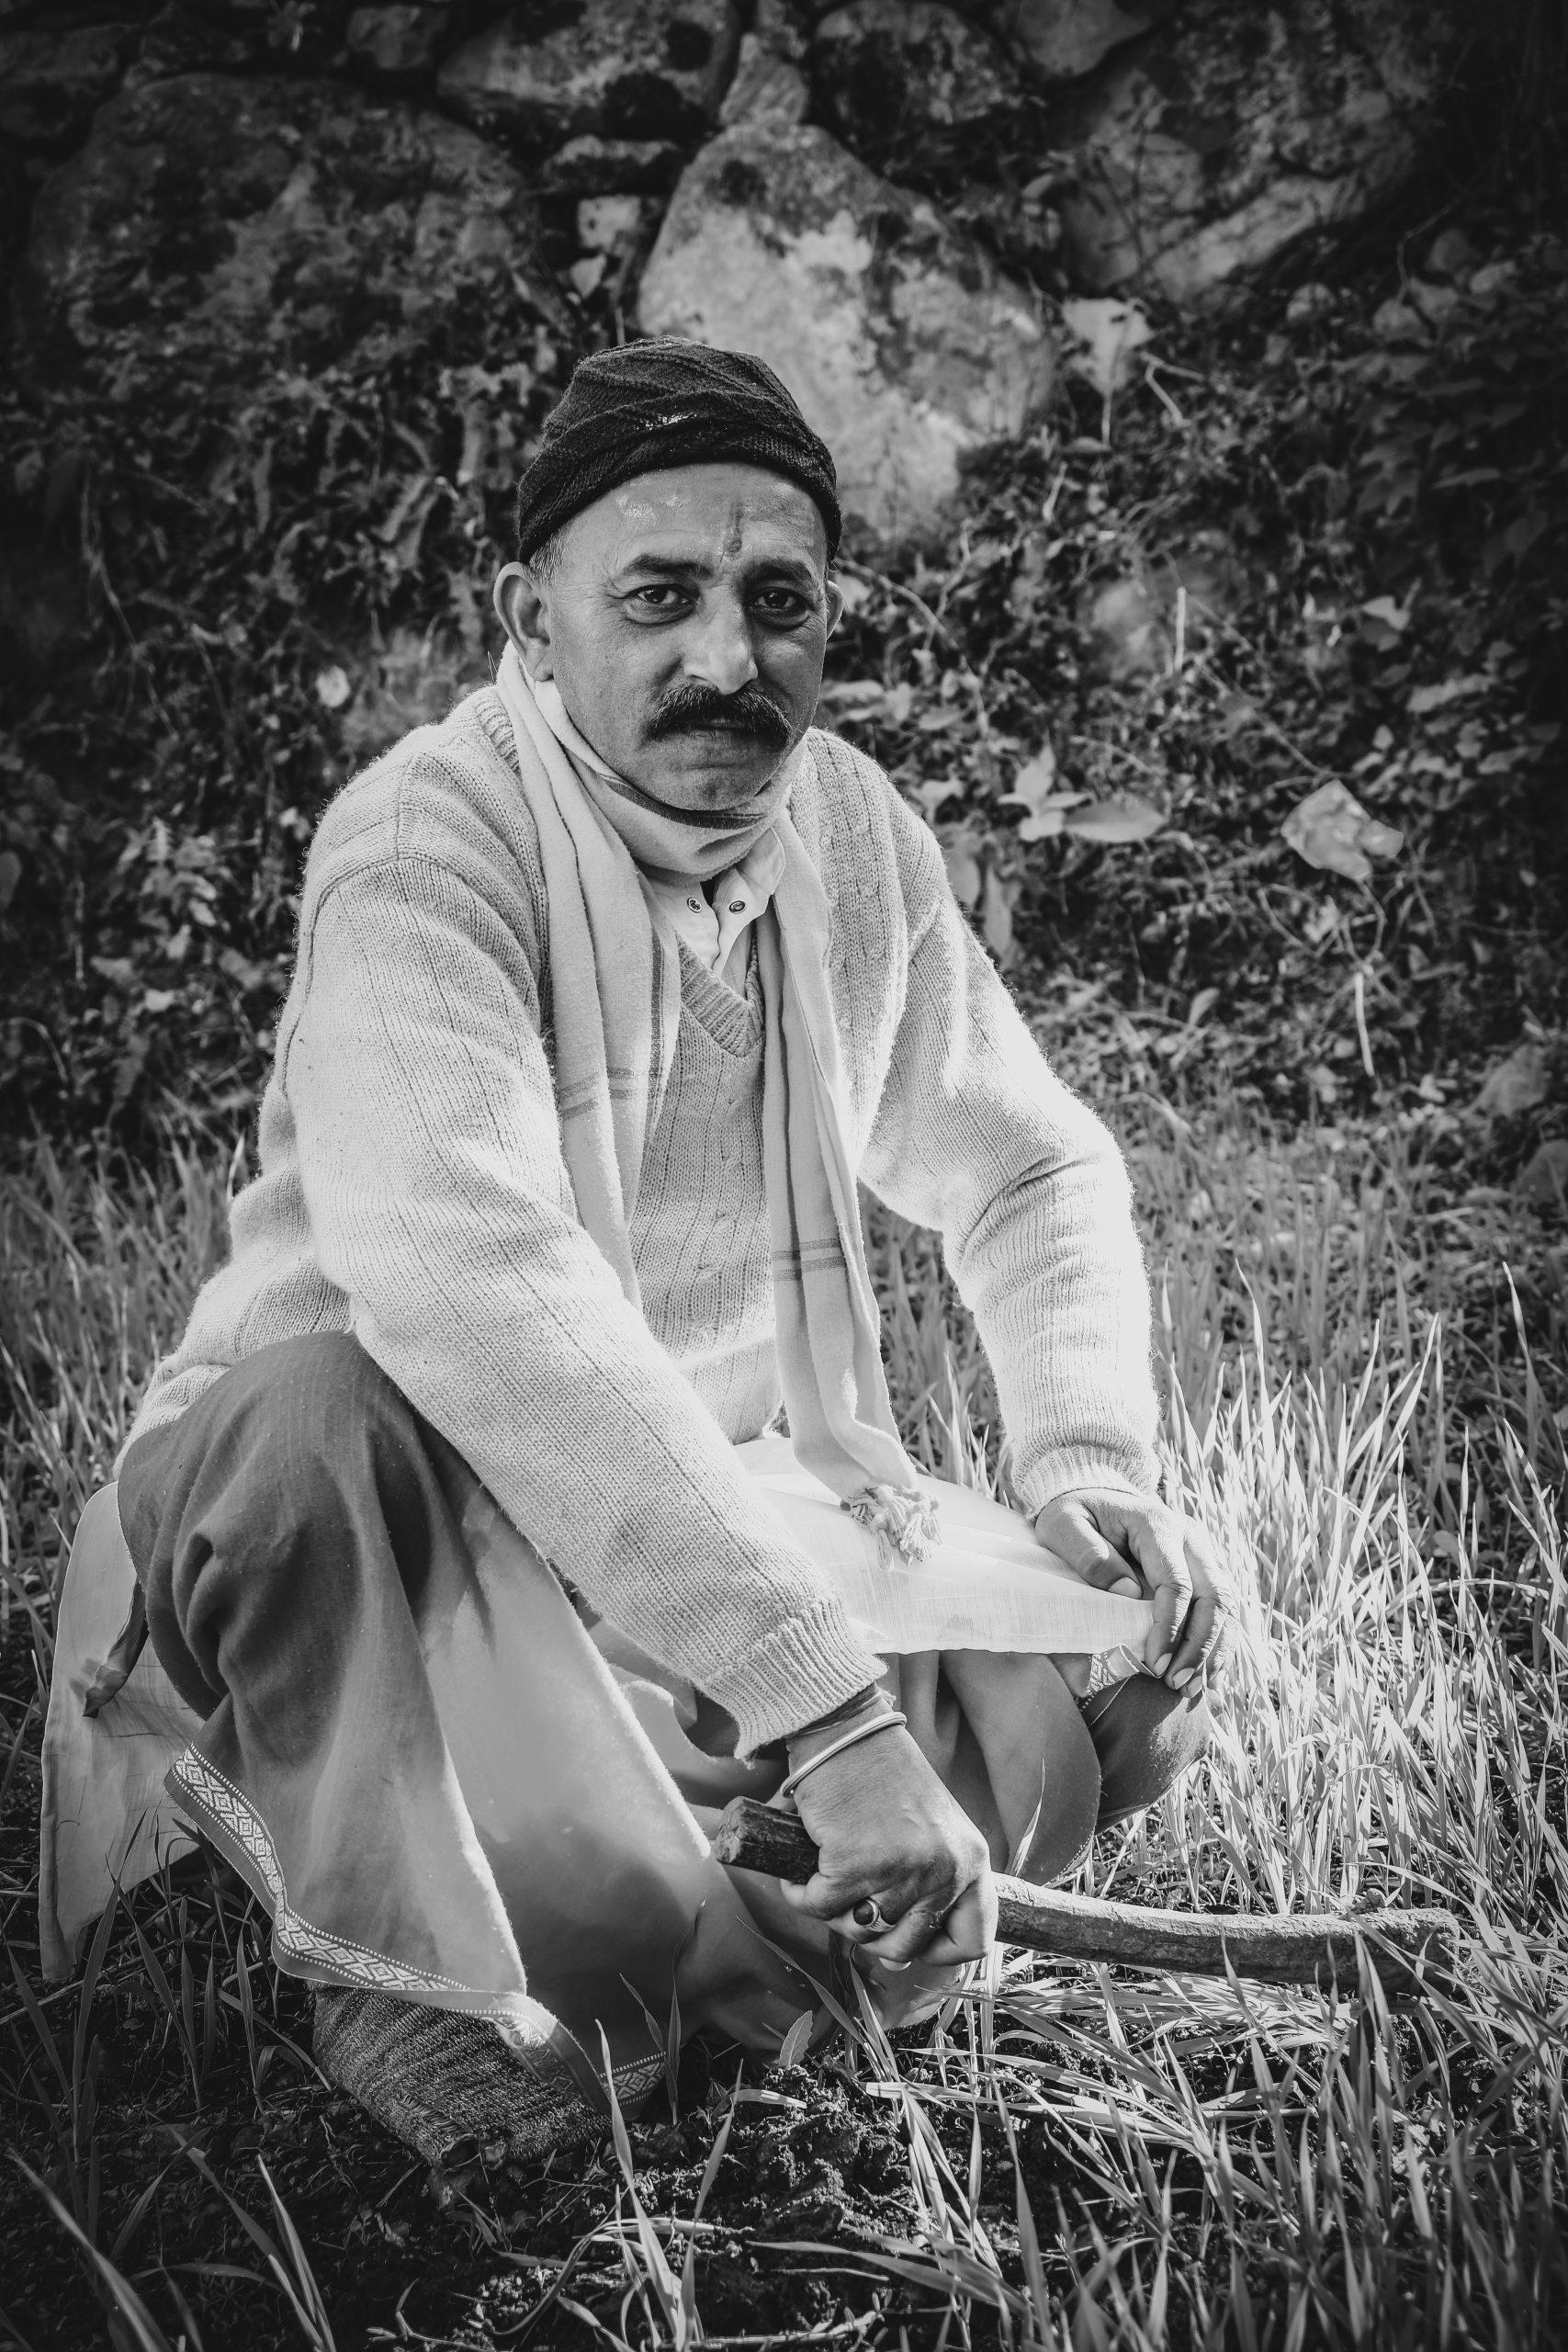 An Indian farmer